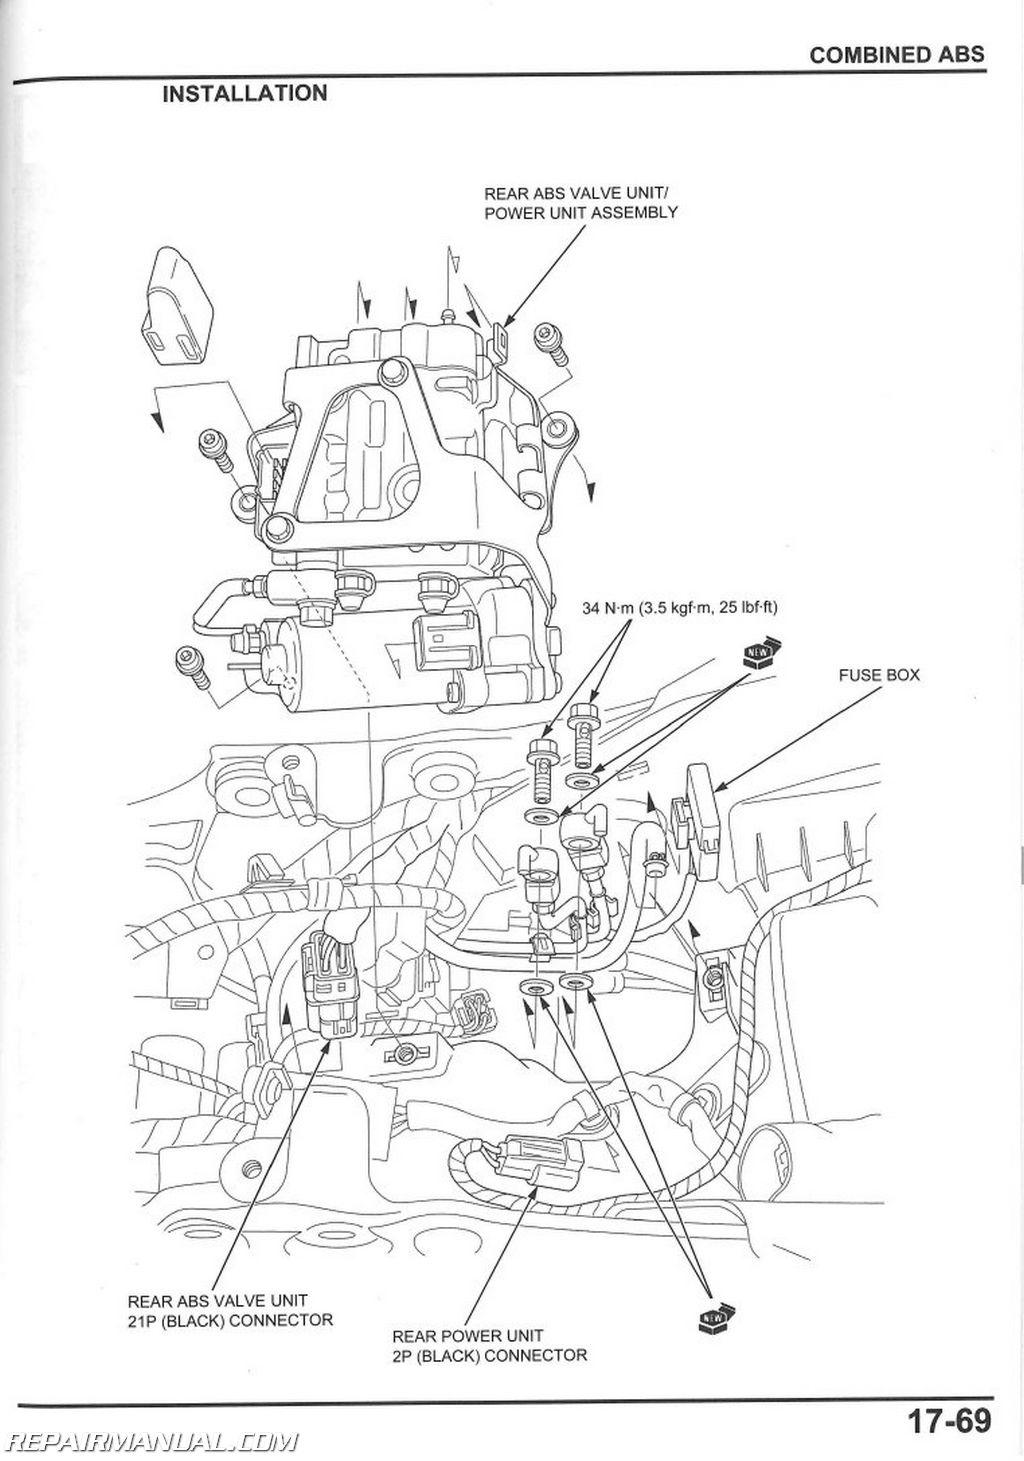 wiring diagram for 2006 honda cbr 1000